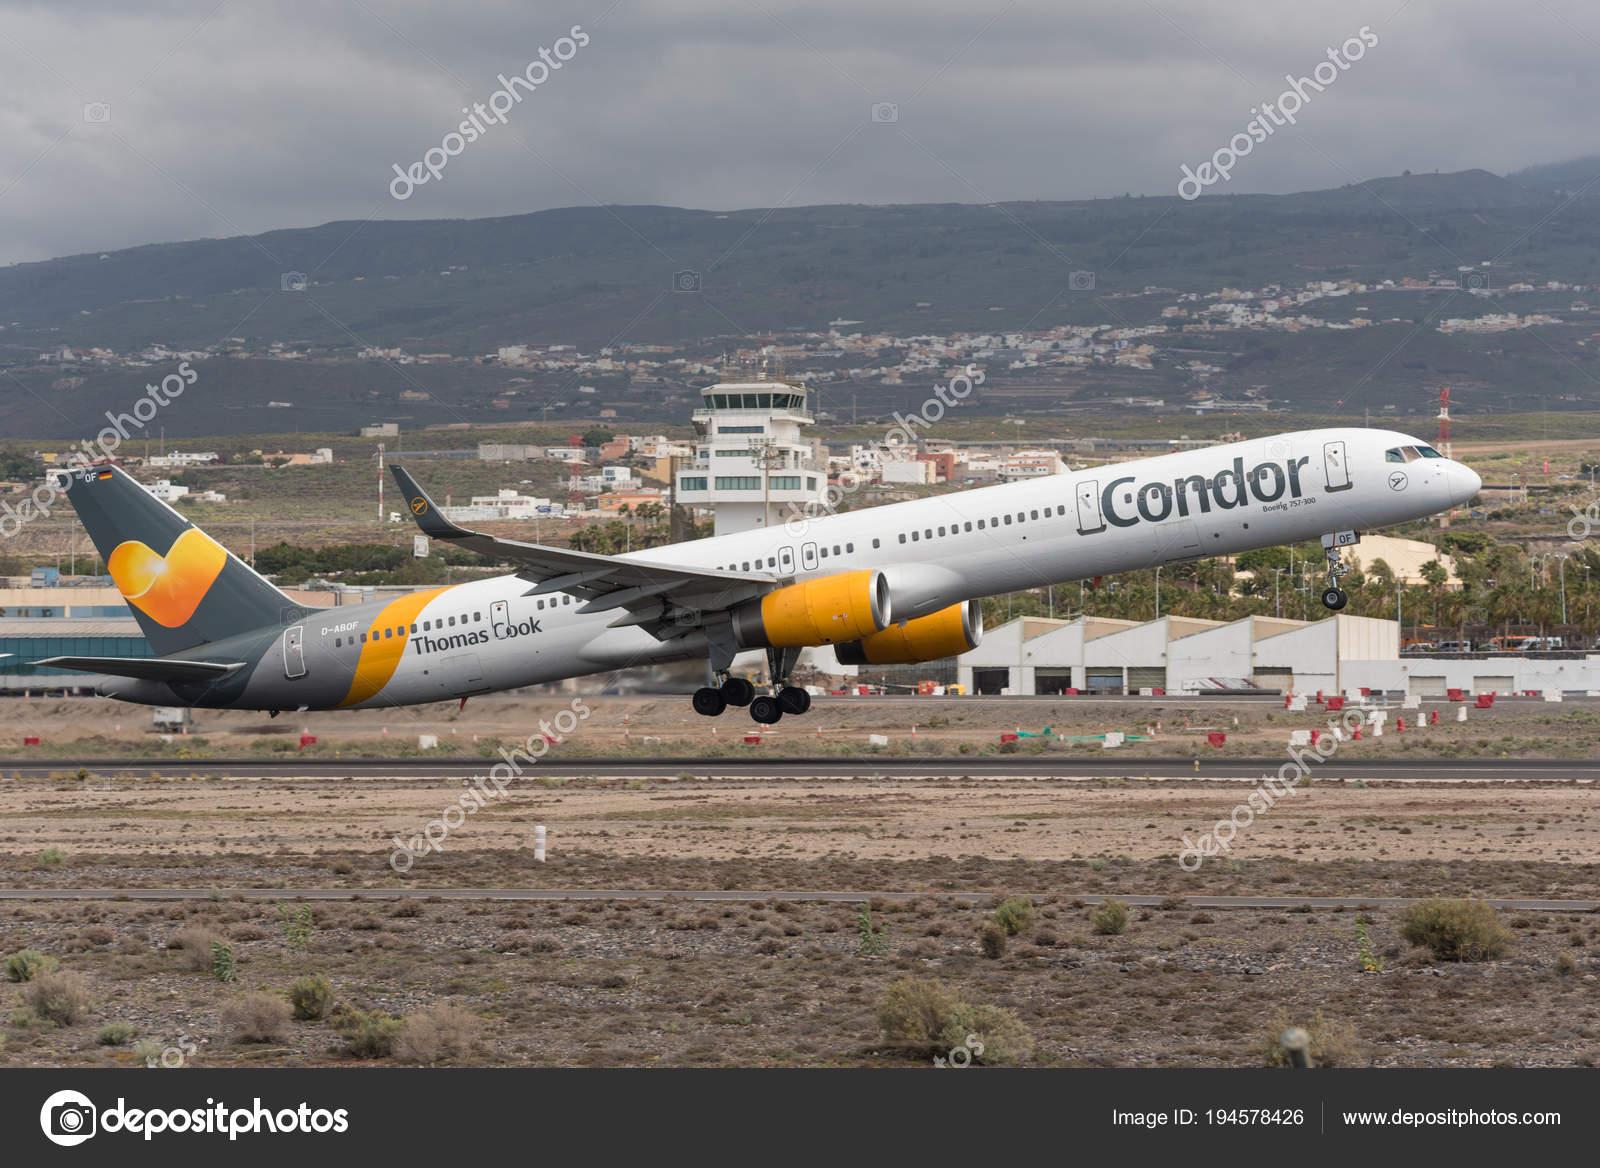 Aeroporto Tenerife Sud : Tenerife spagna 29 aprile 2018: thomas cook condor boeing 757 300